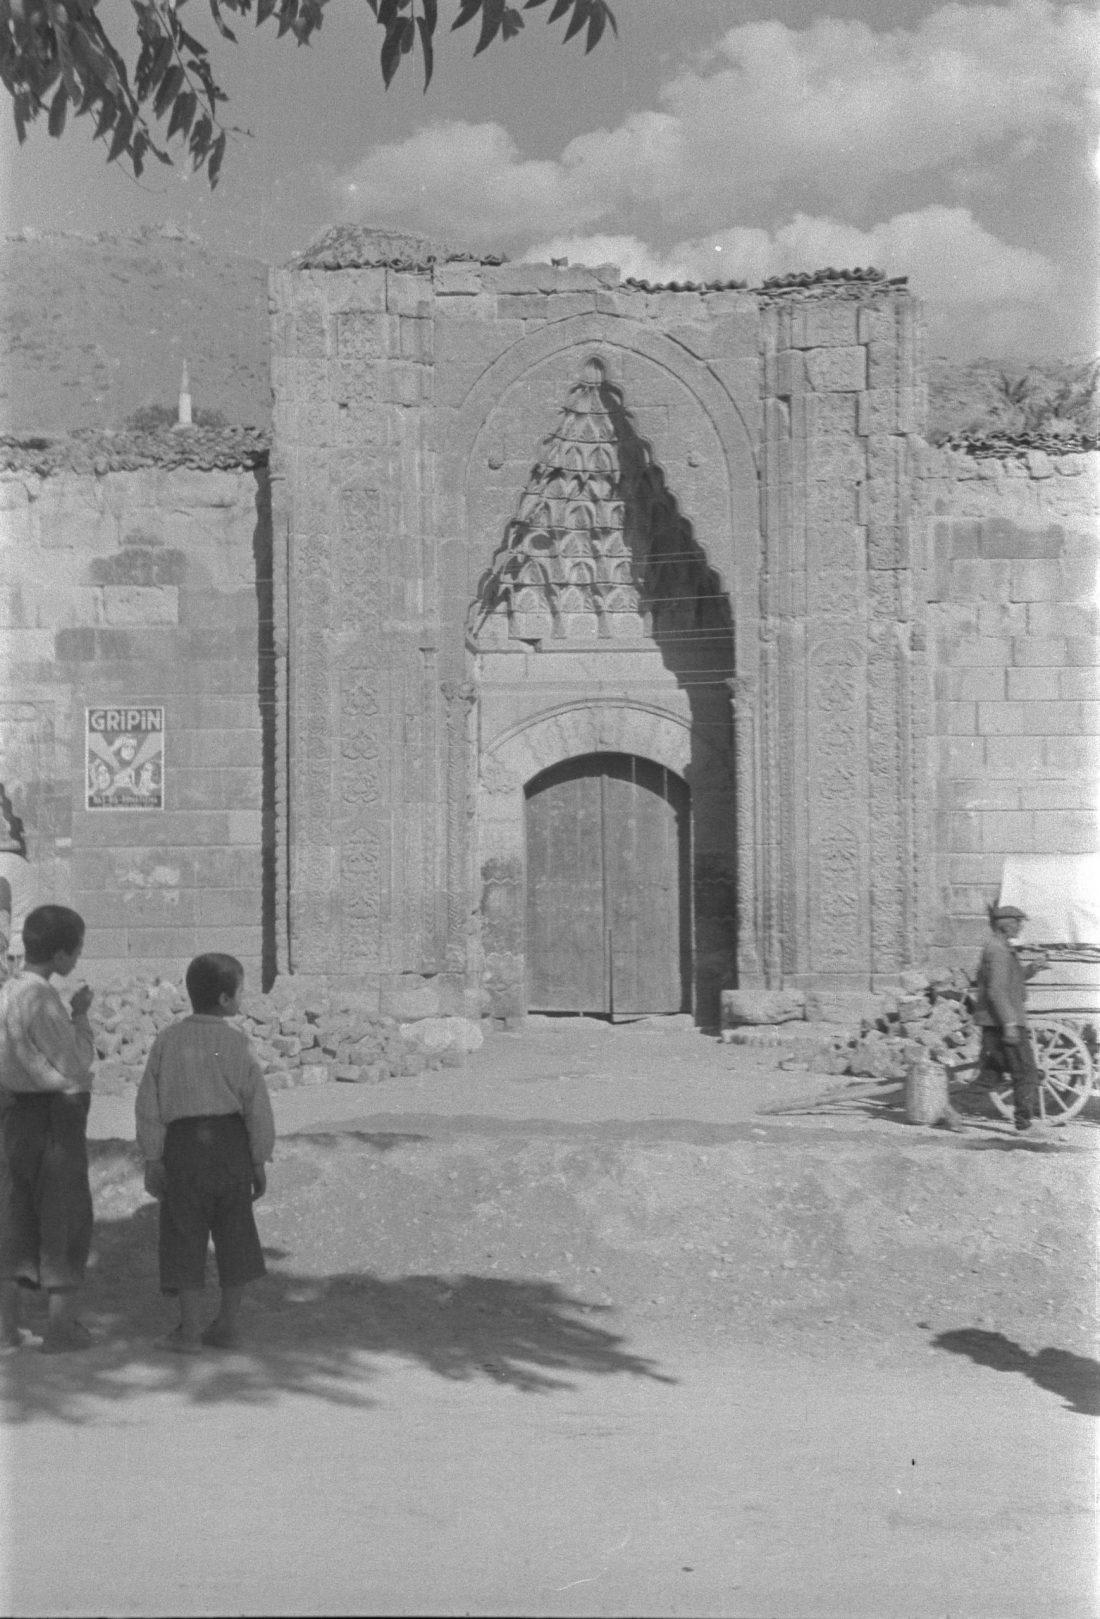 A. Eckstein, Tımarhane Girişi, Amasya, 1937